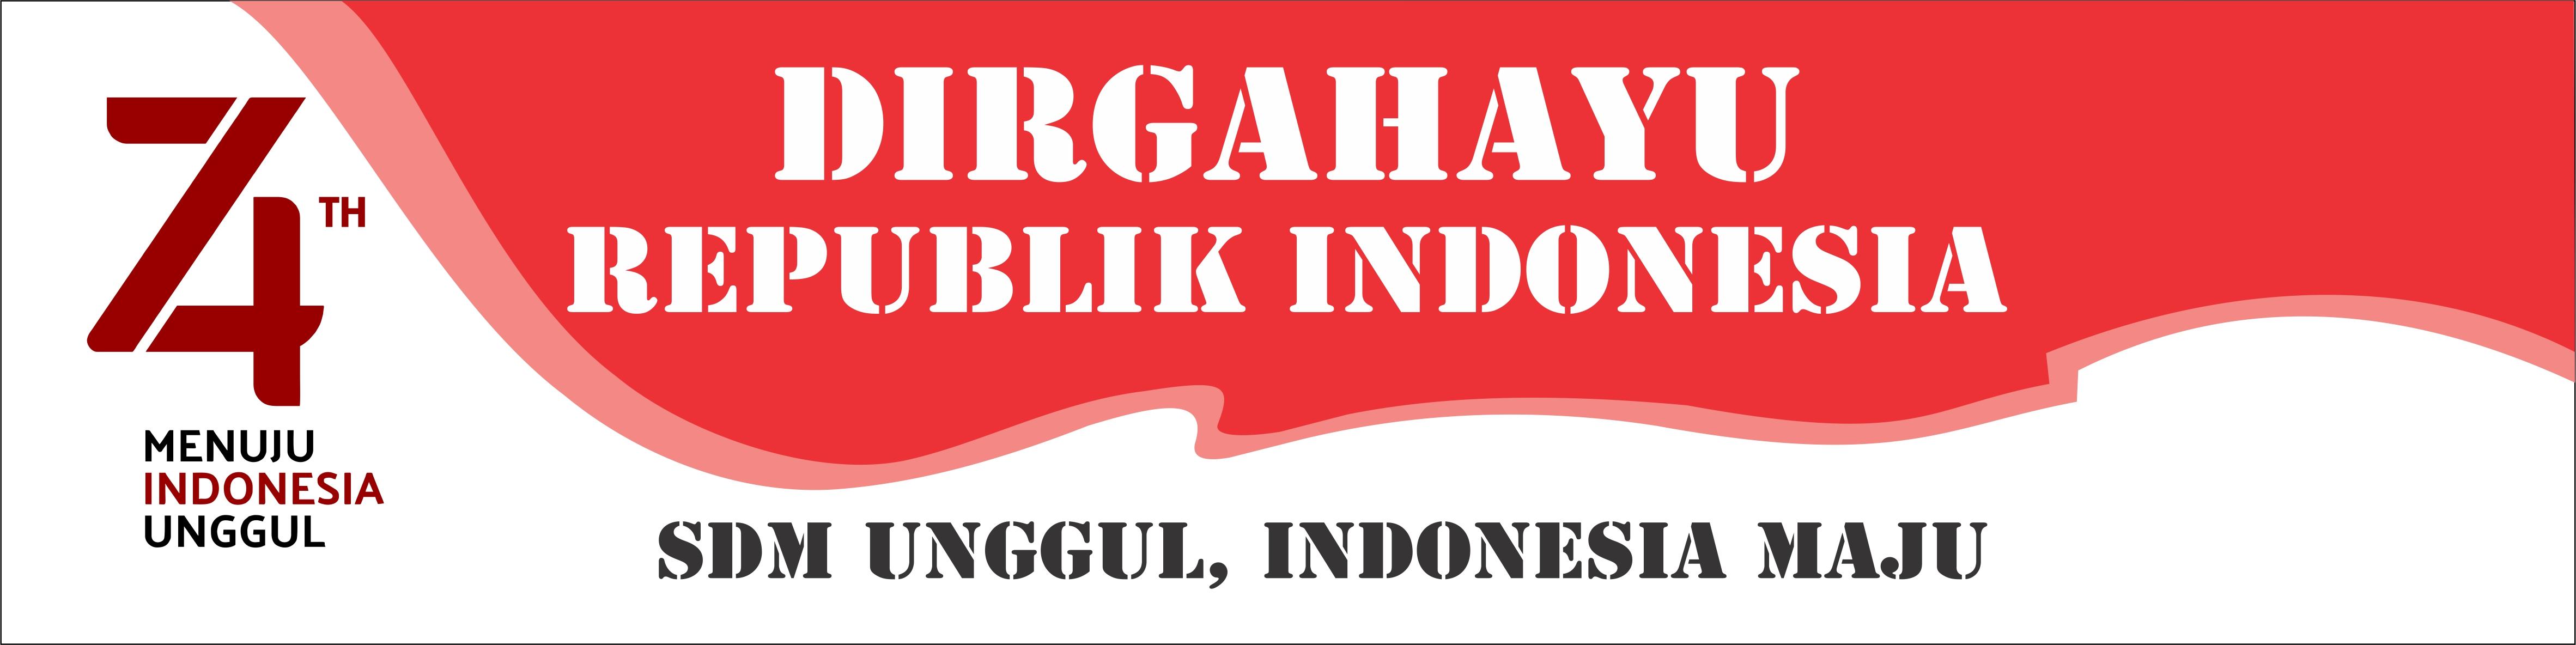 Banner Spanduk HUT RI 17 Agustus